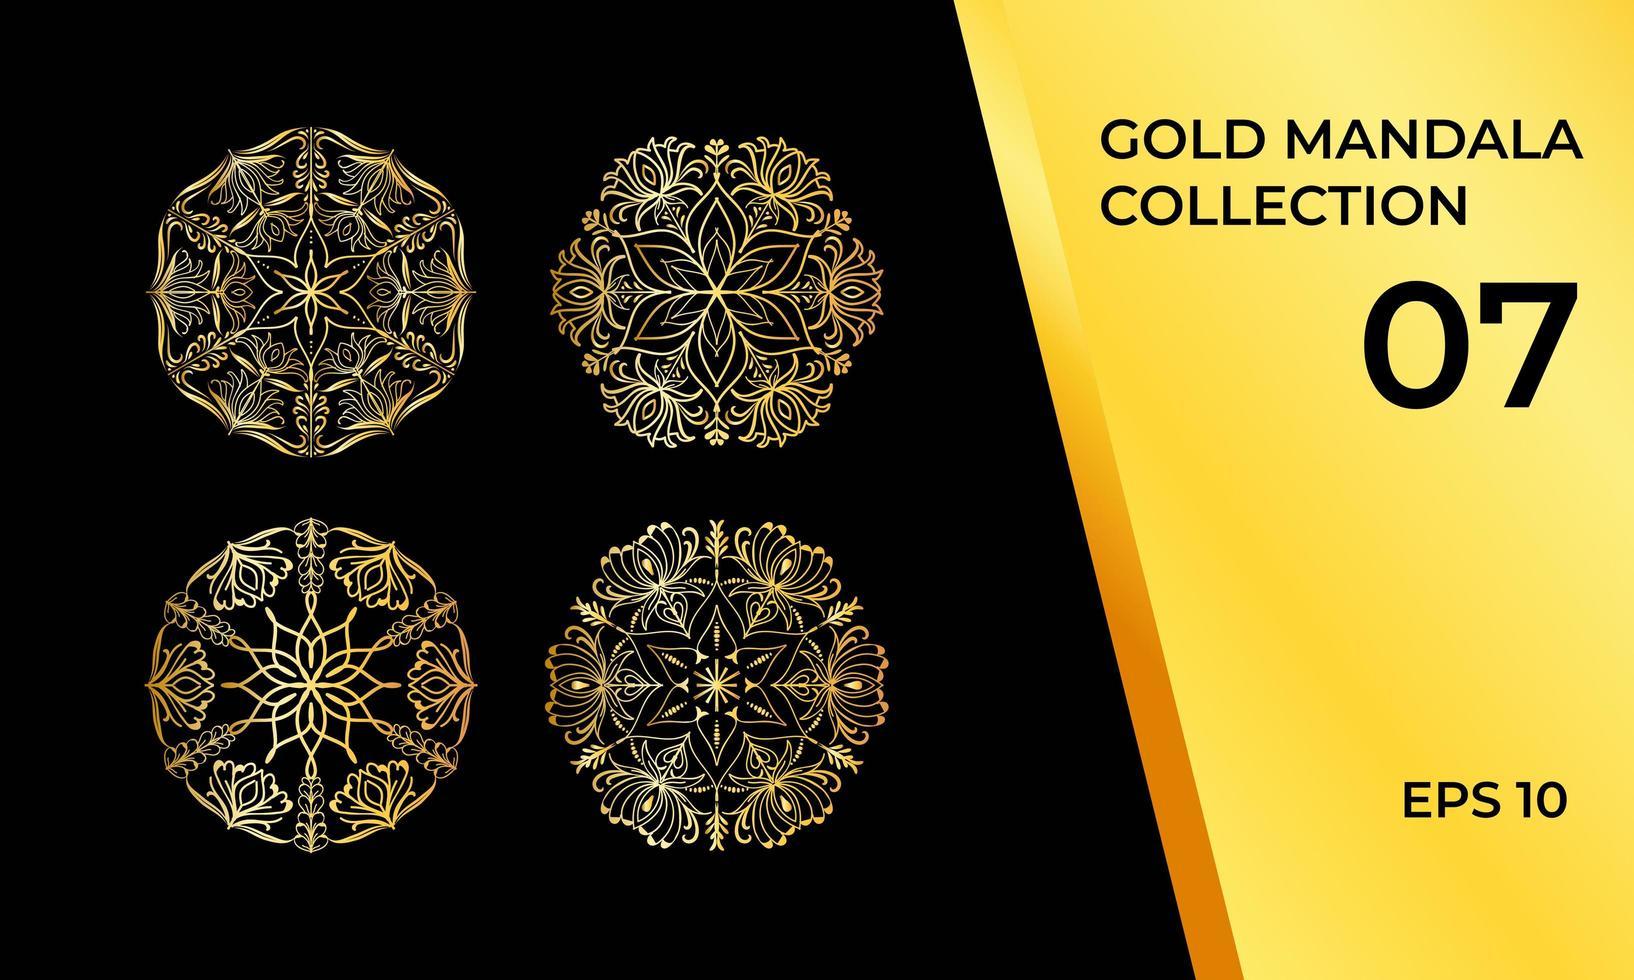 detaljerat gyllene mandala-paket med 4 vektor